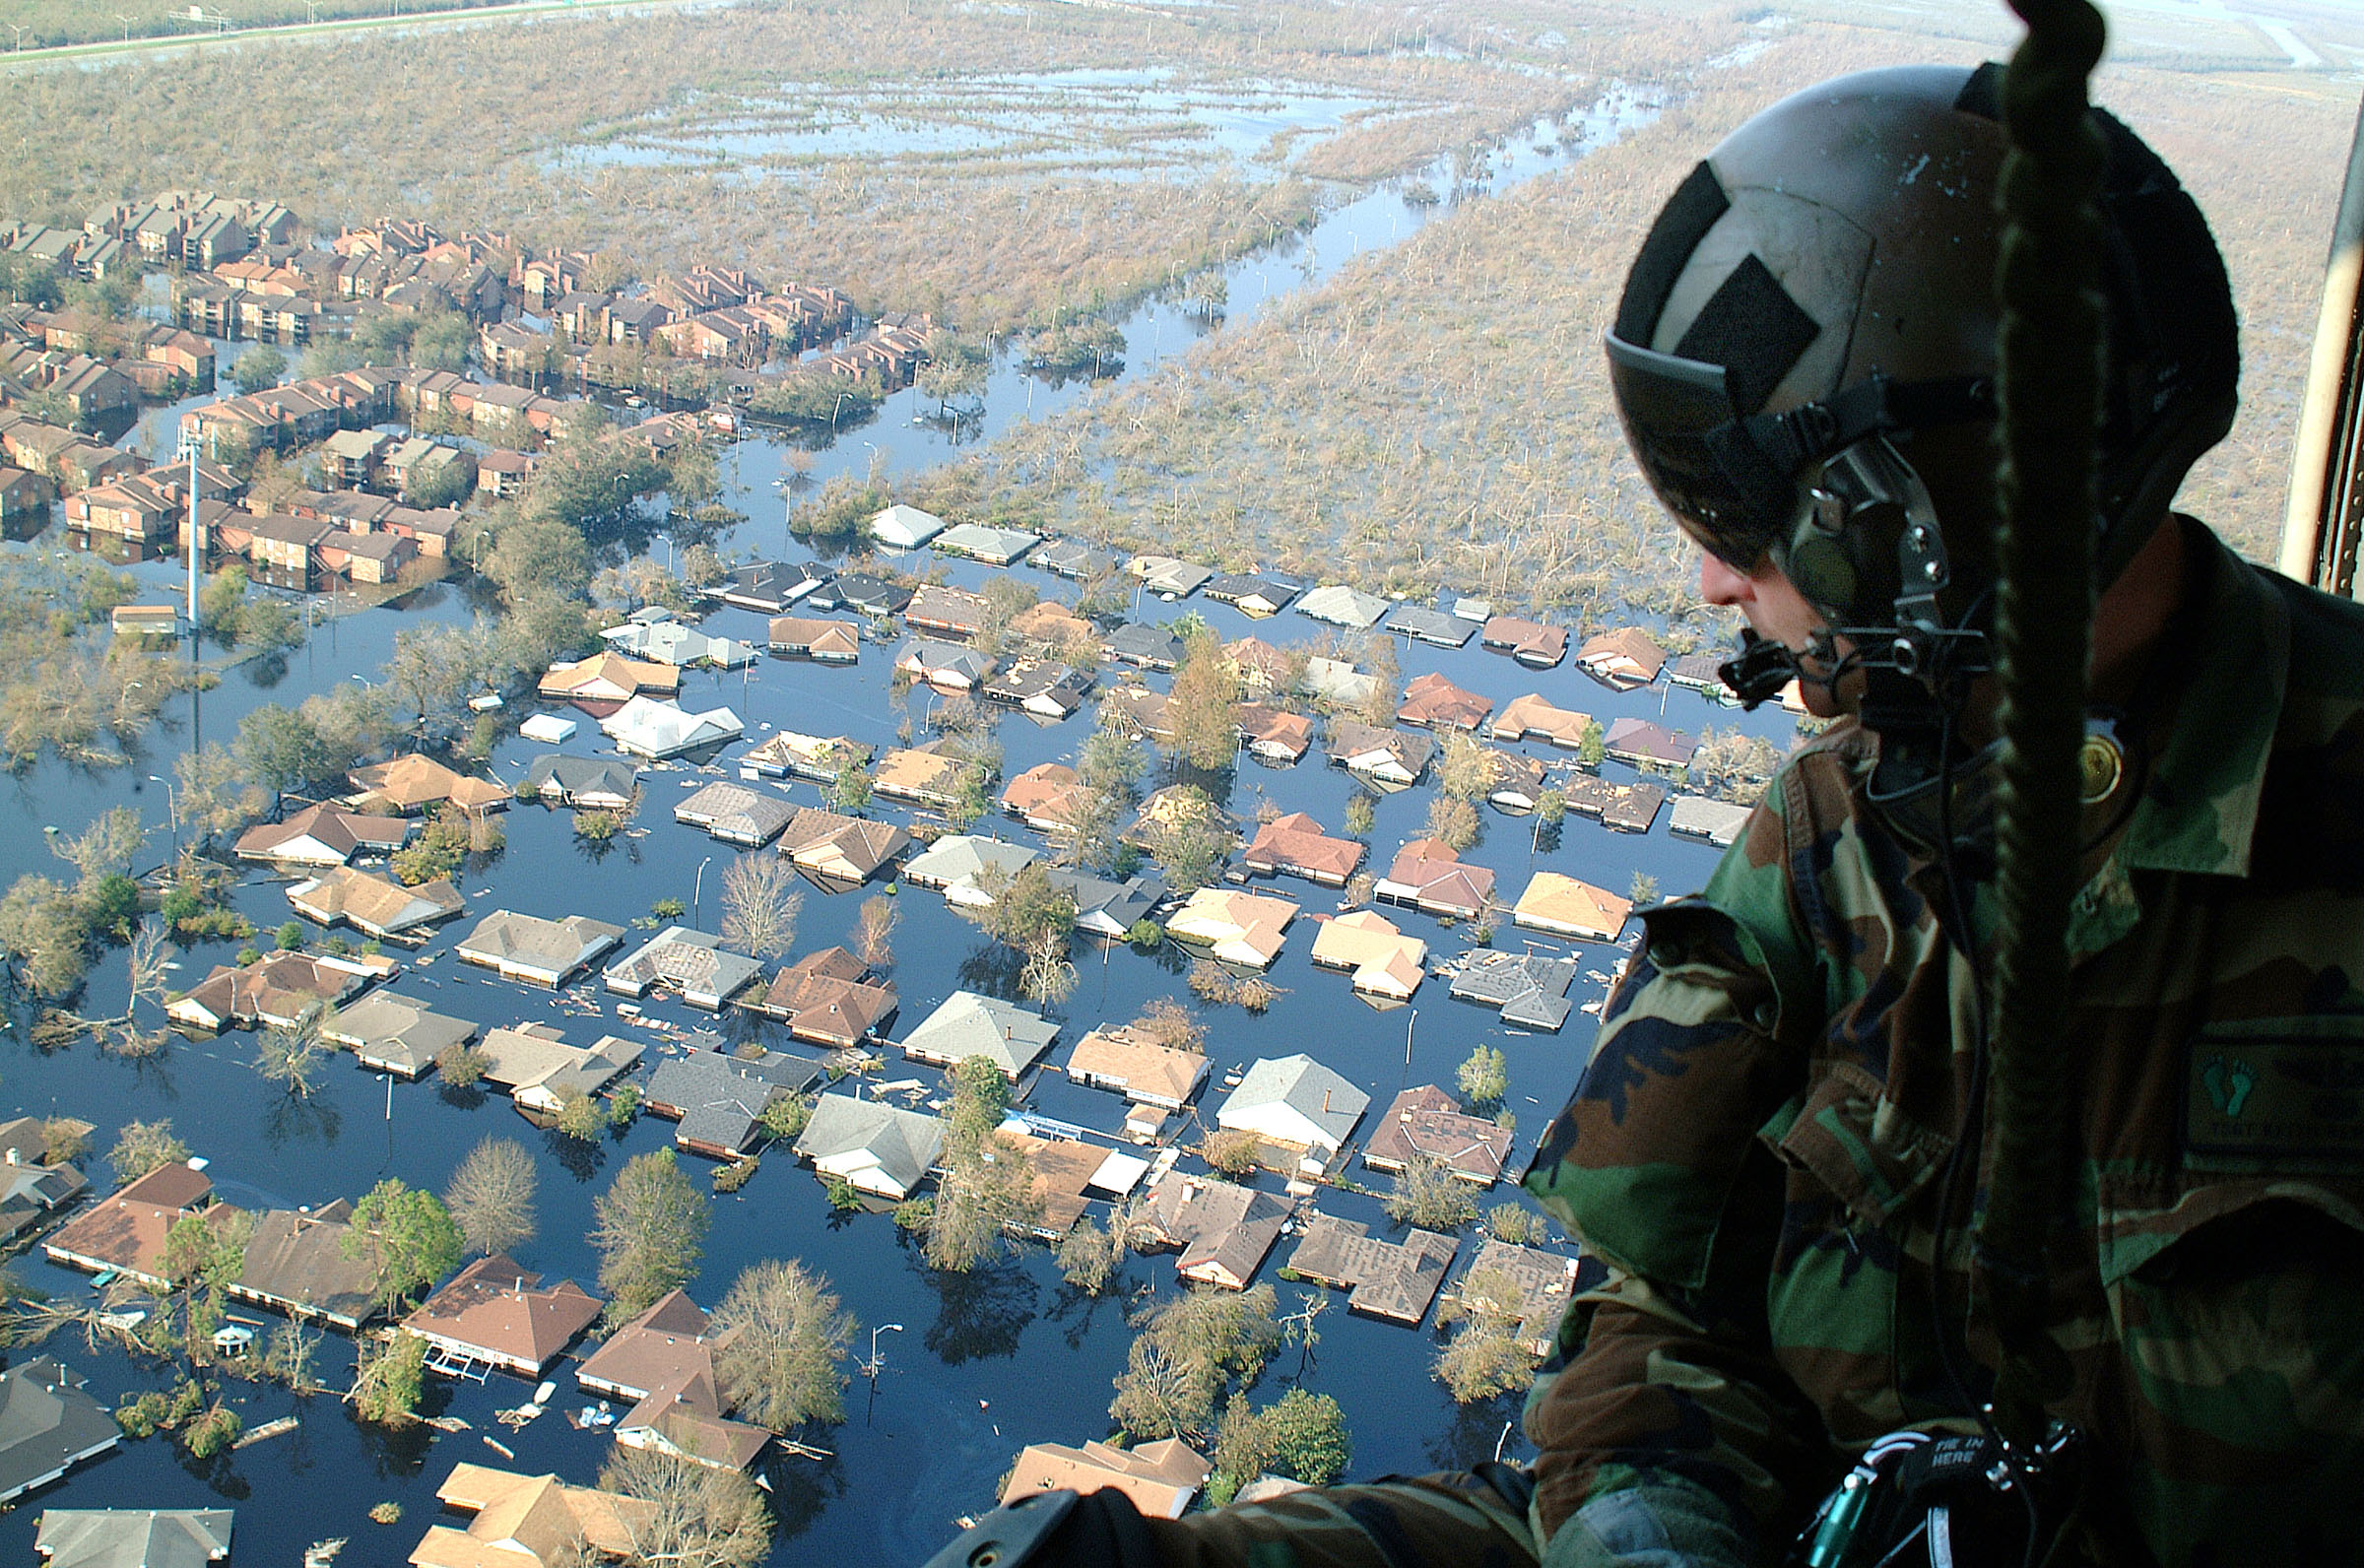 Soldier surveys destruction wrought by Hurricane Katrina. Source:  hearttoheart.org